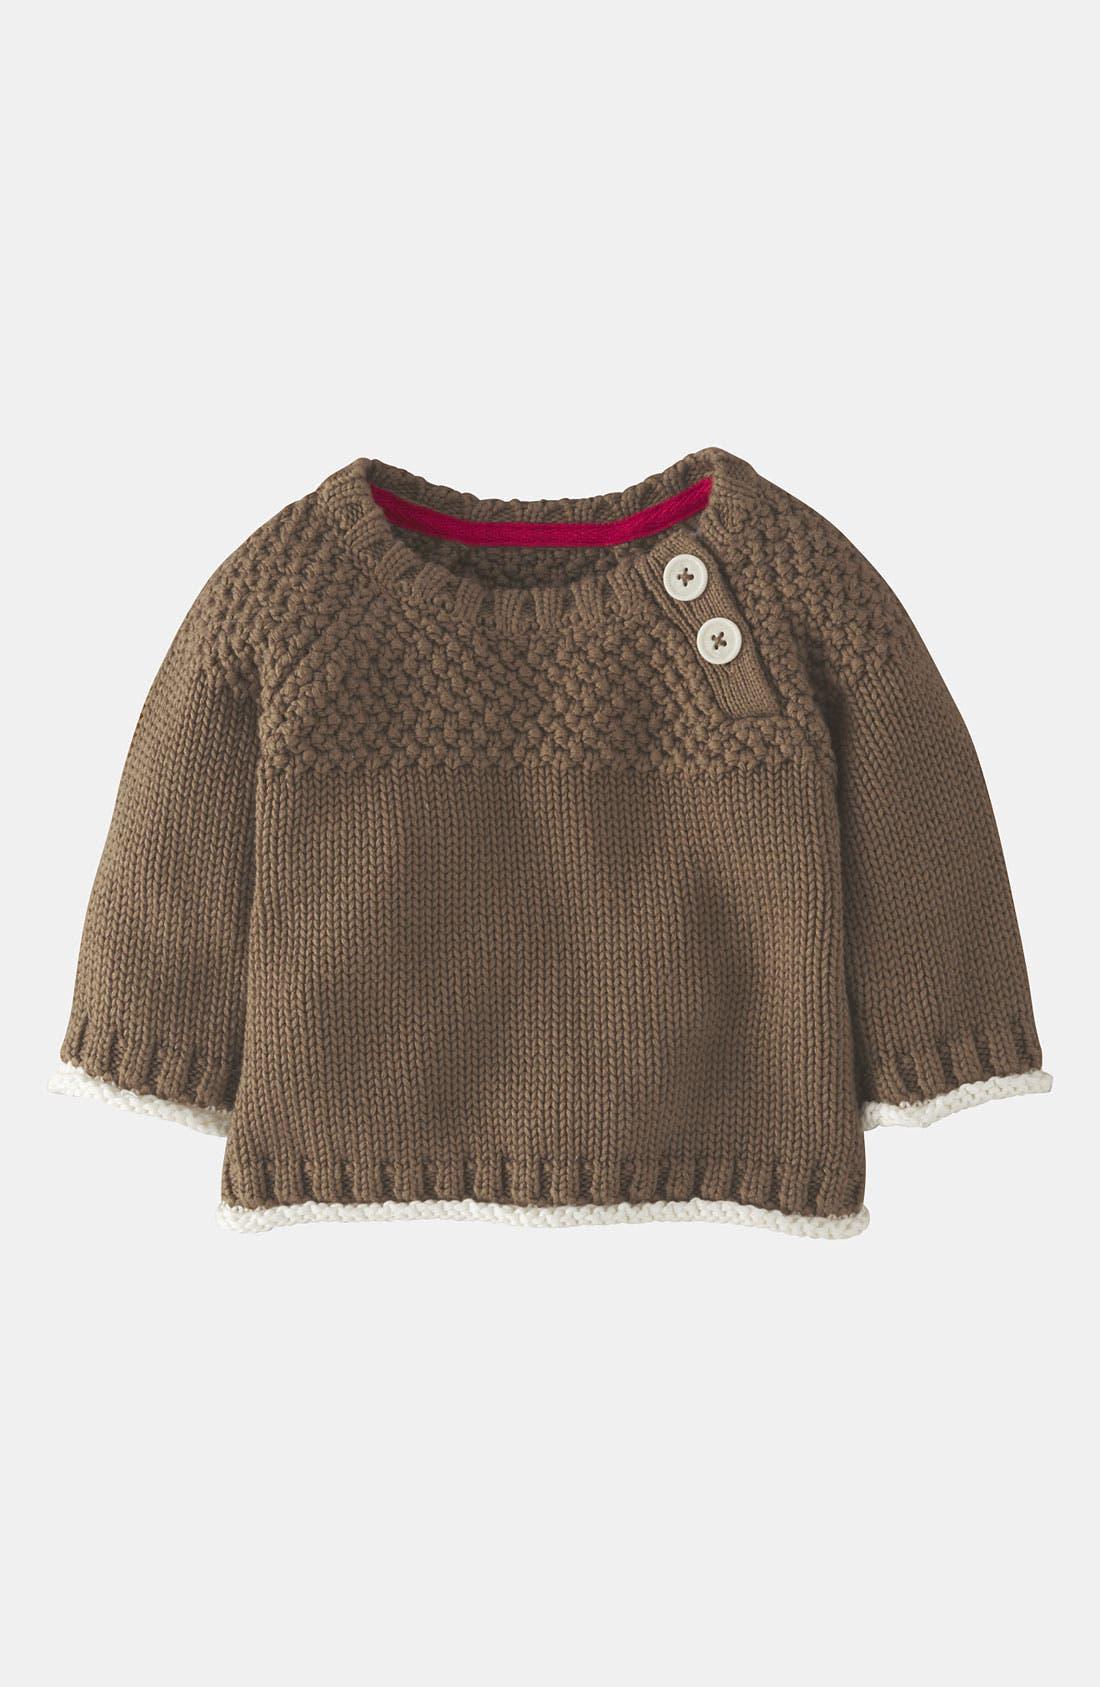 Main Image - Mini Boden Knit Sweater (Baby)